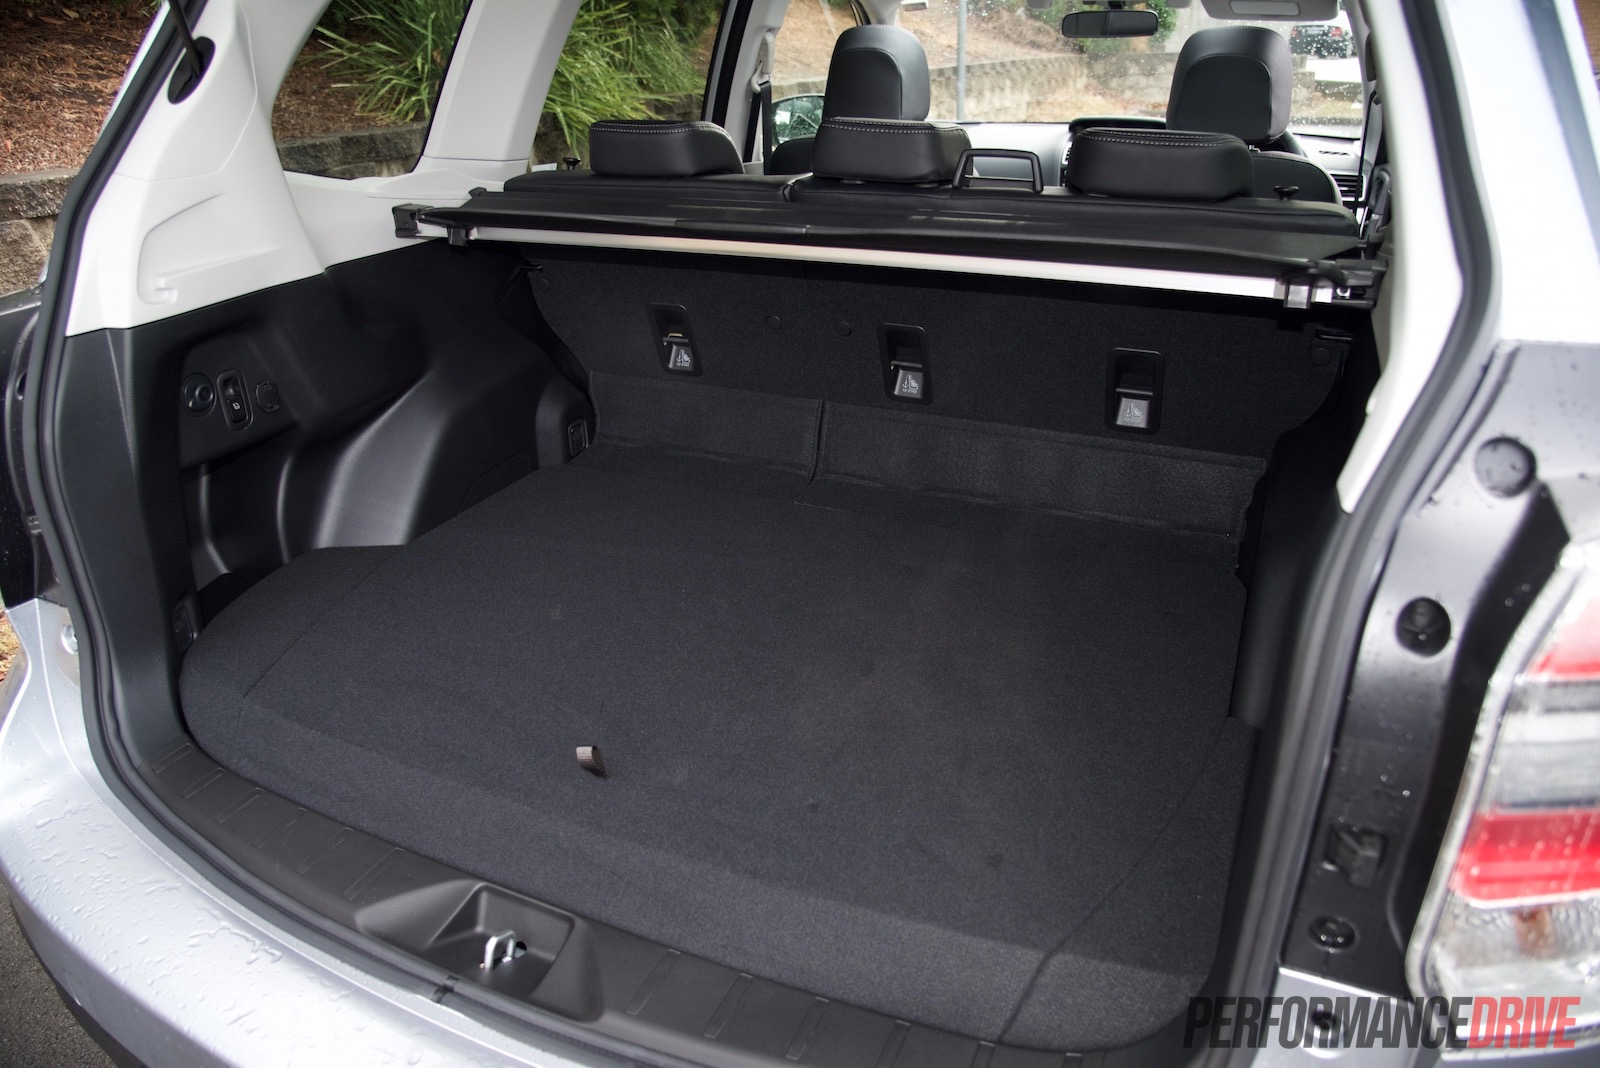 Subaru Forester Cargo Space >> 2016 Subaru Forester Xt Premium Review Video